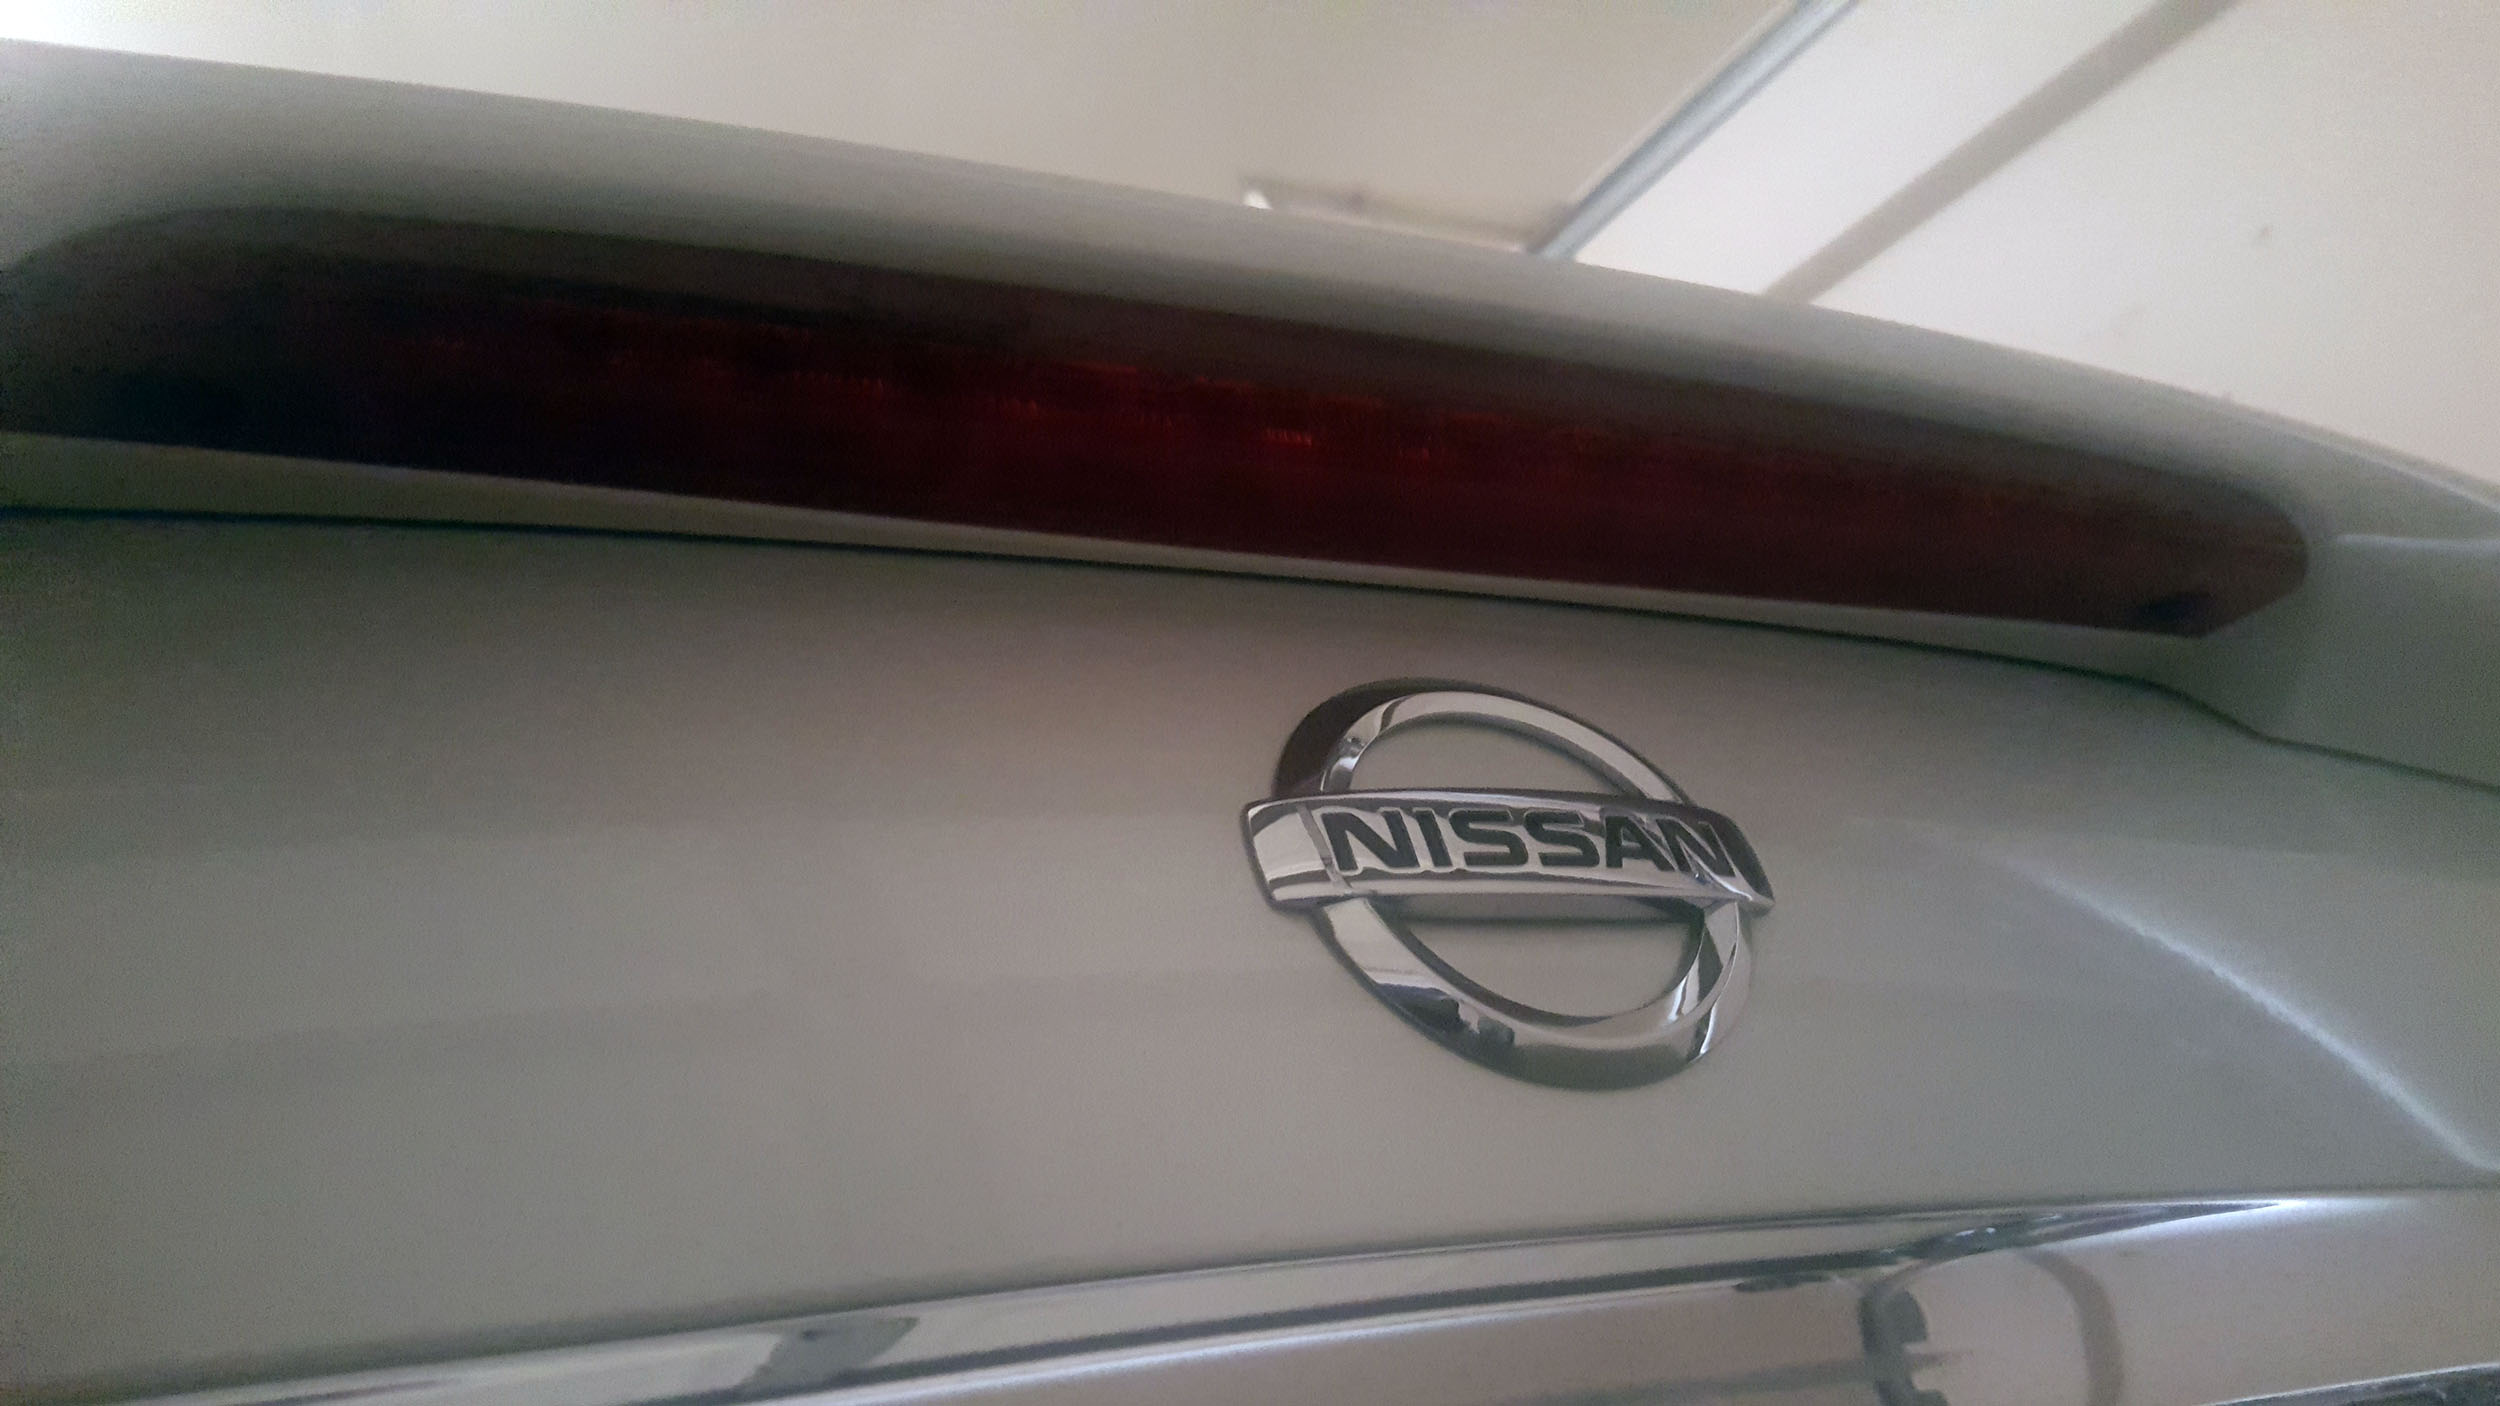 Nissan 95 Maxima Light Spoiler